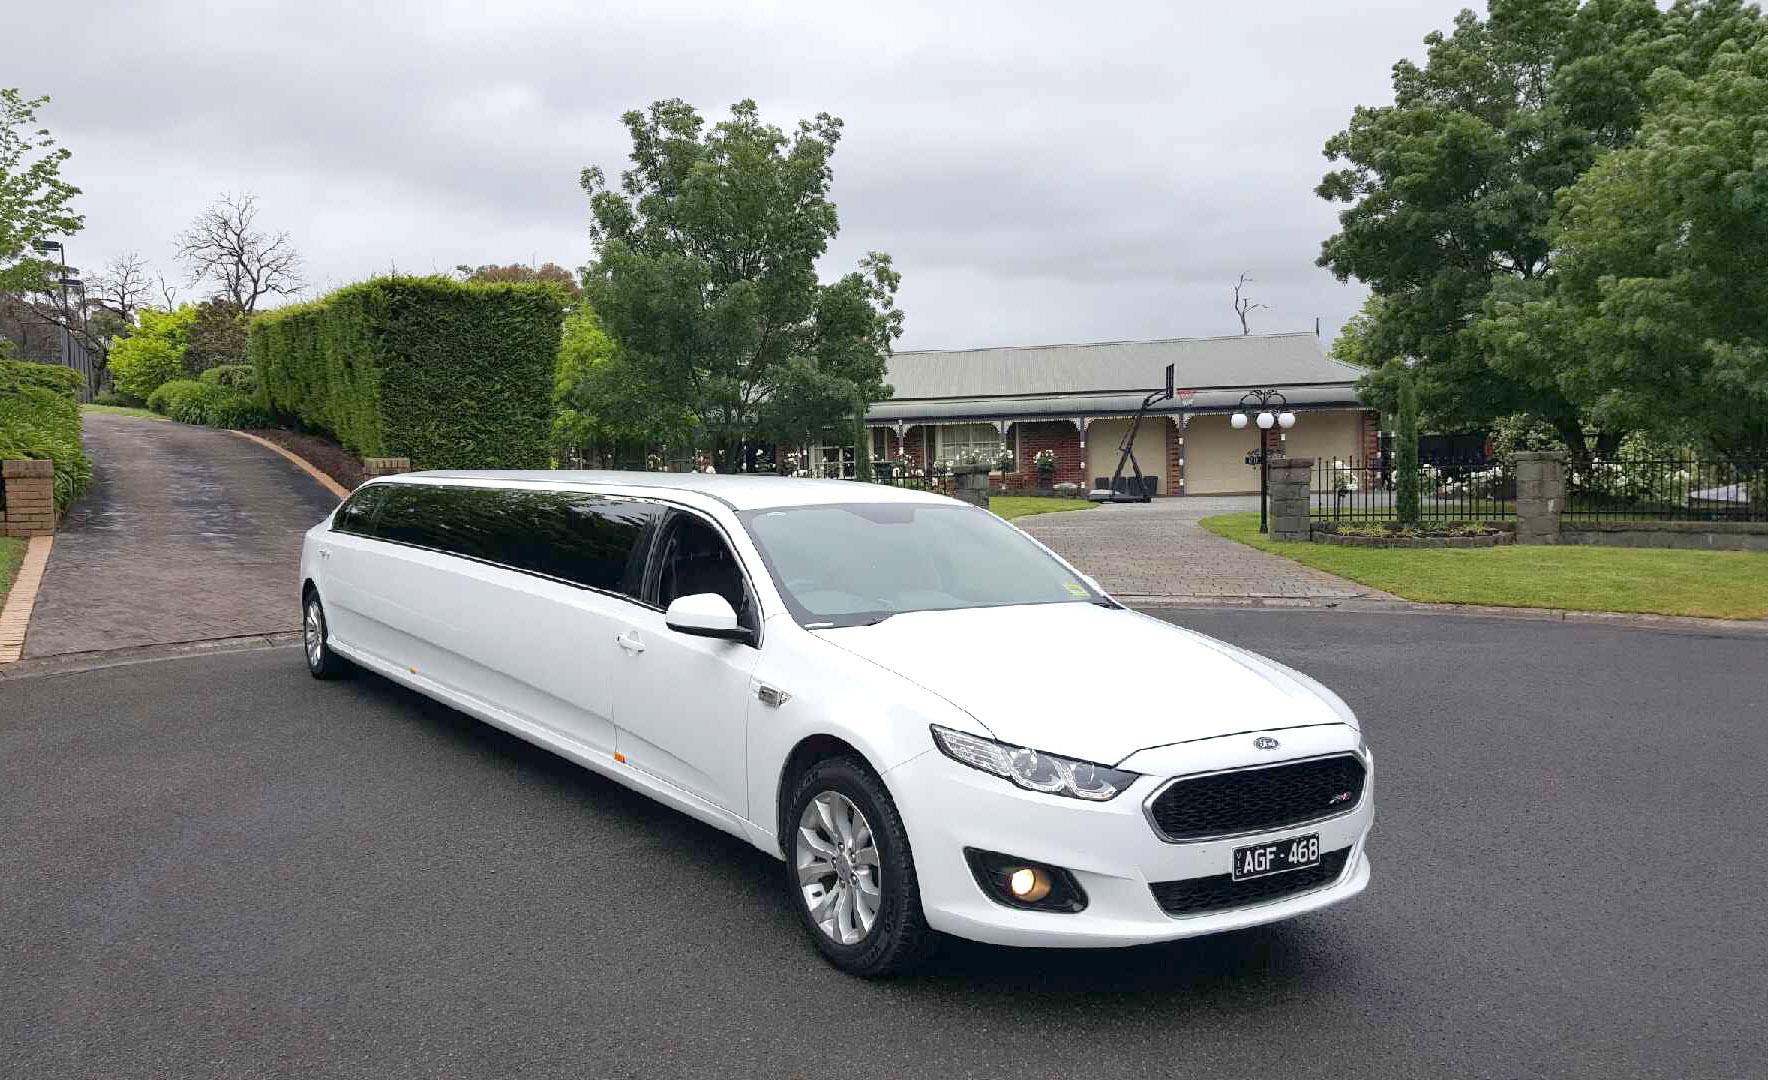 13 passenger limousine